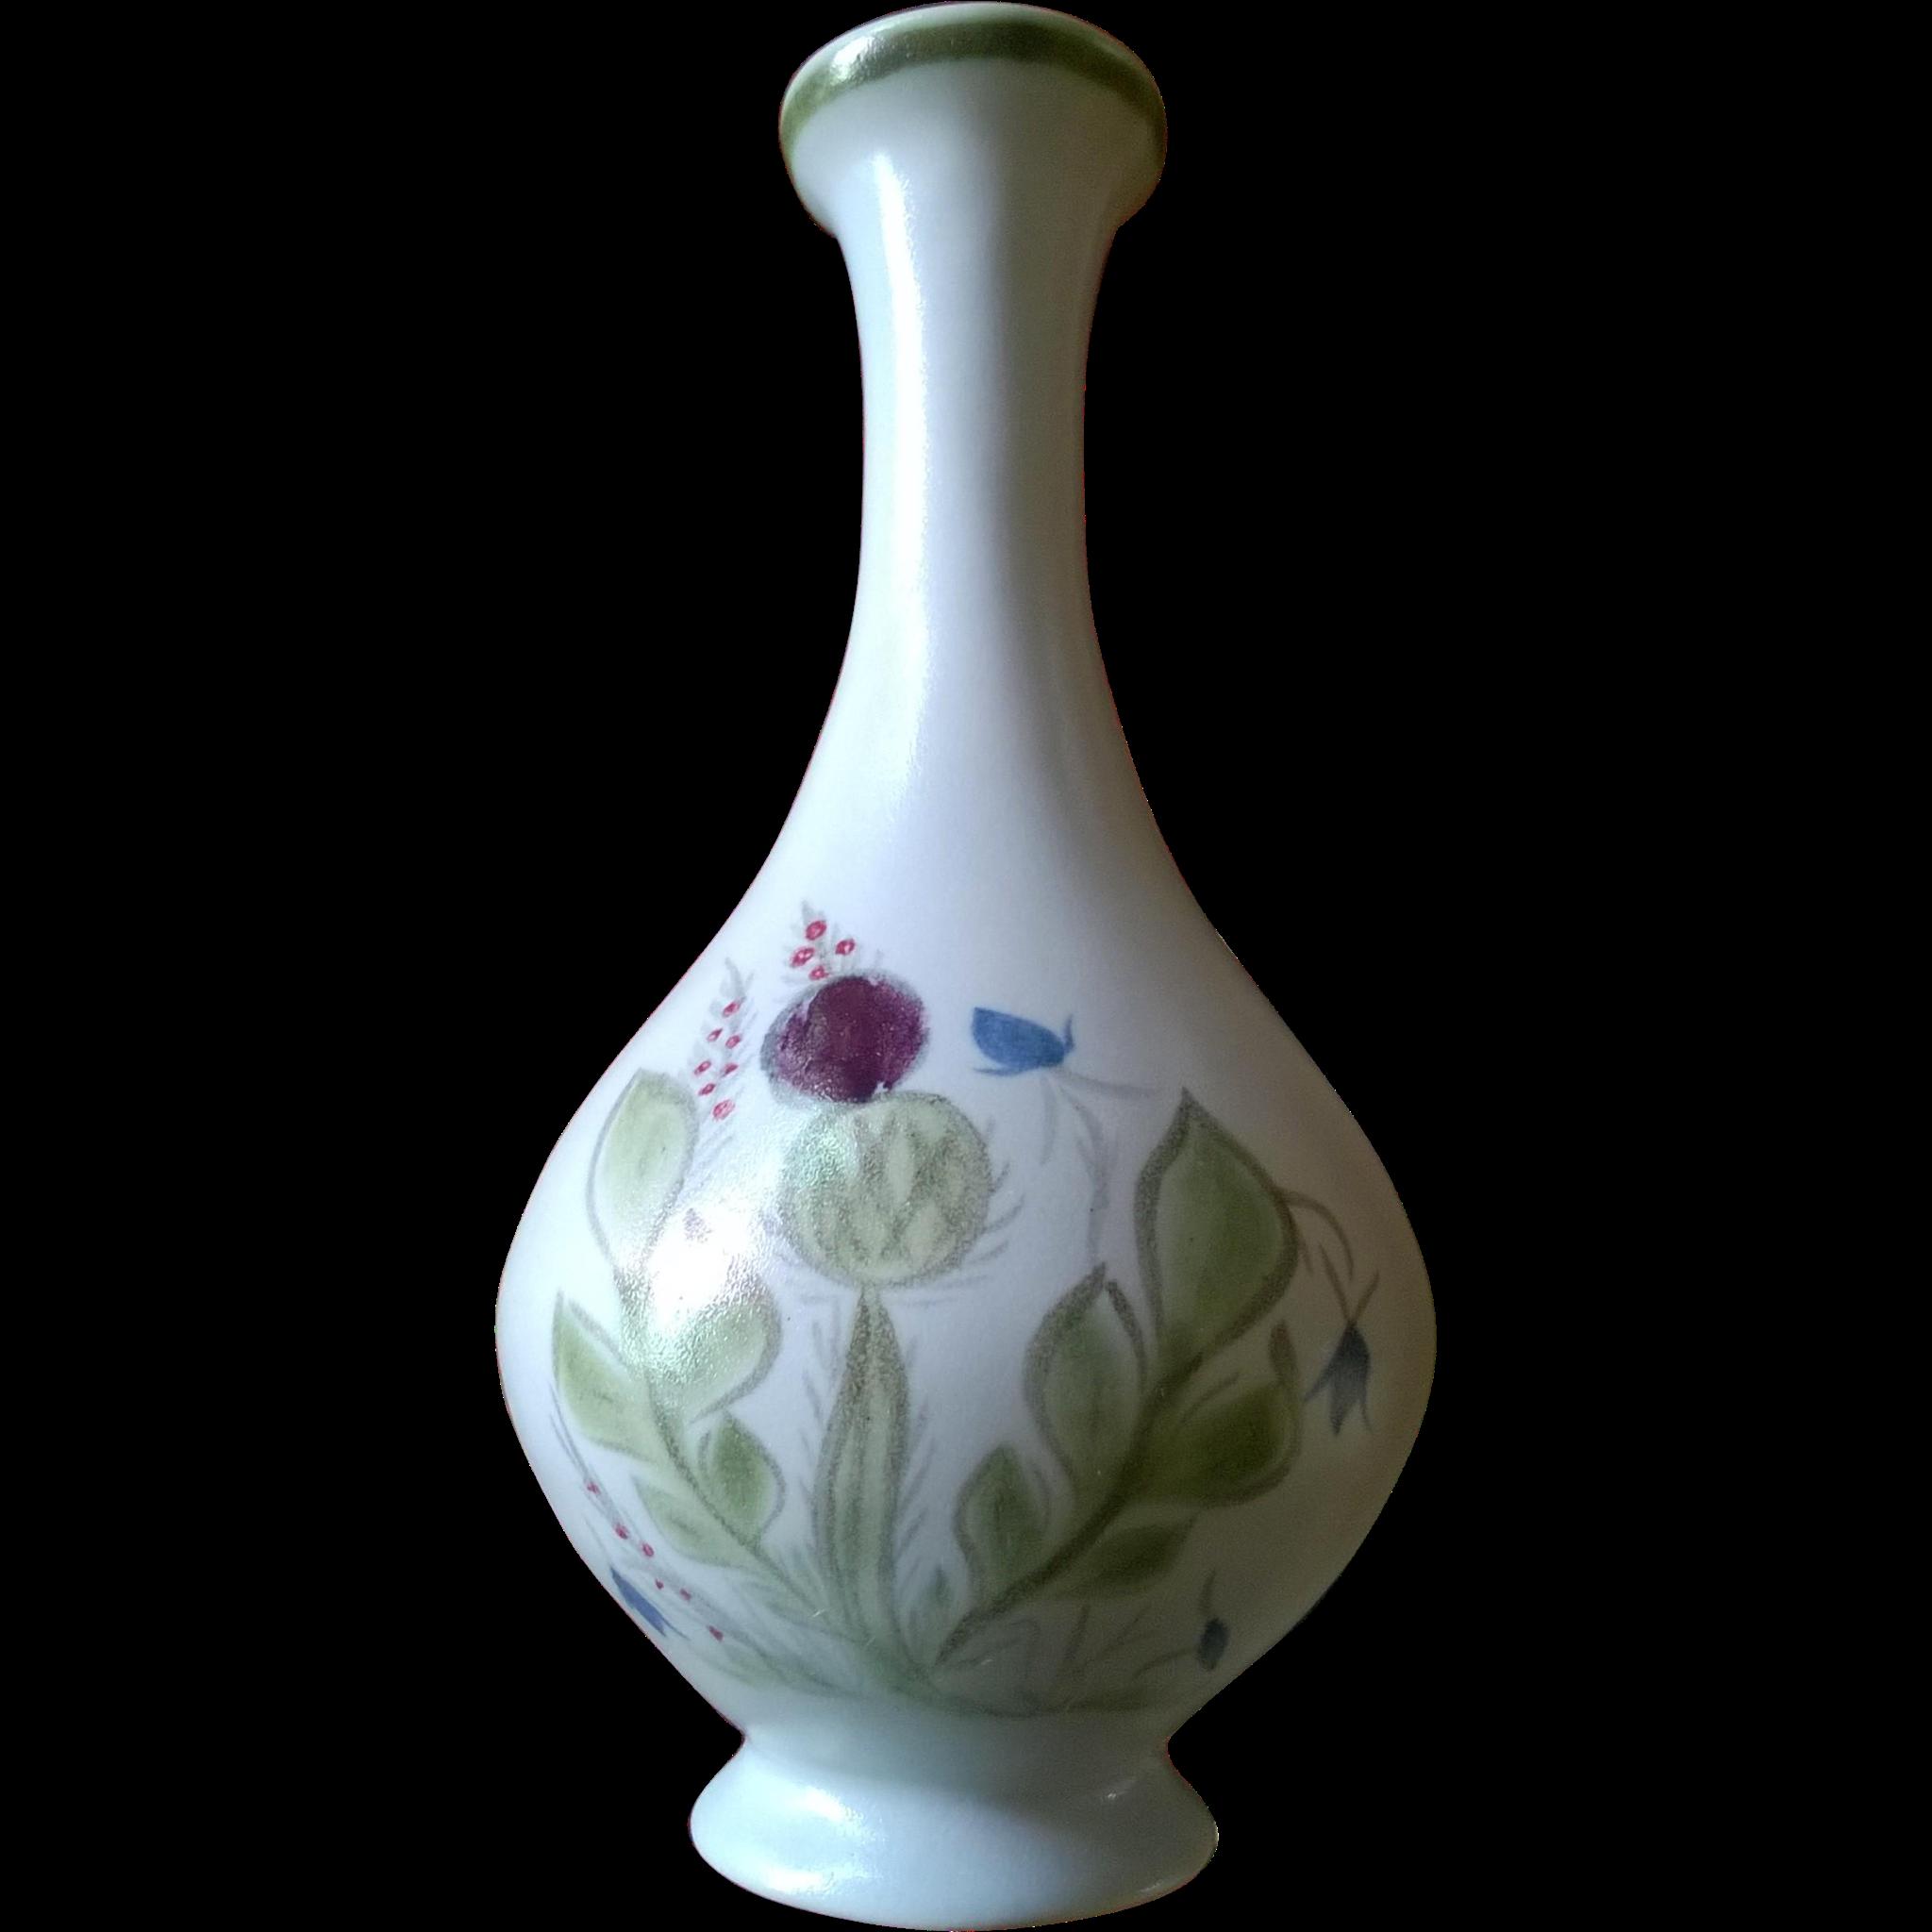 Buchan Pottery Thistleware Bud Vase